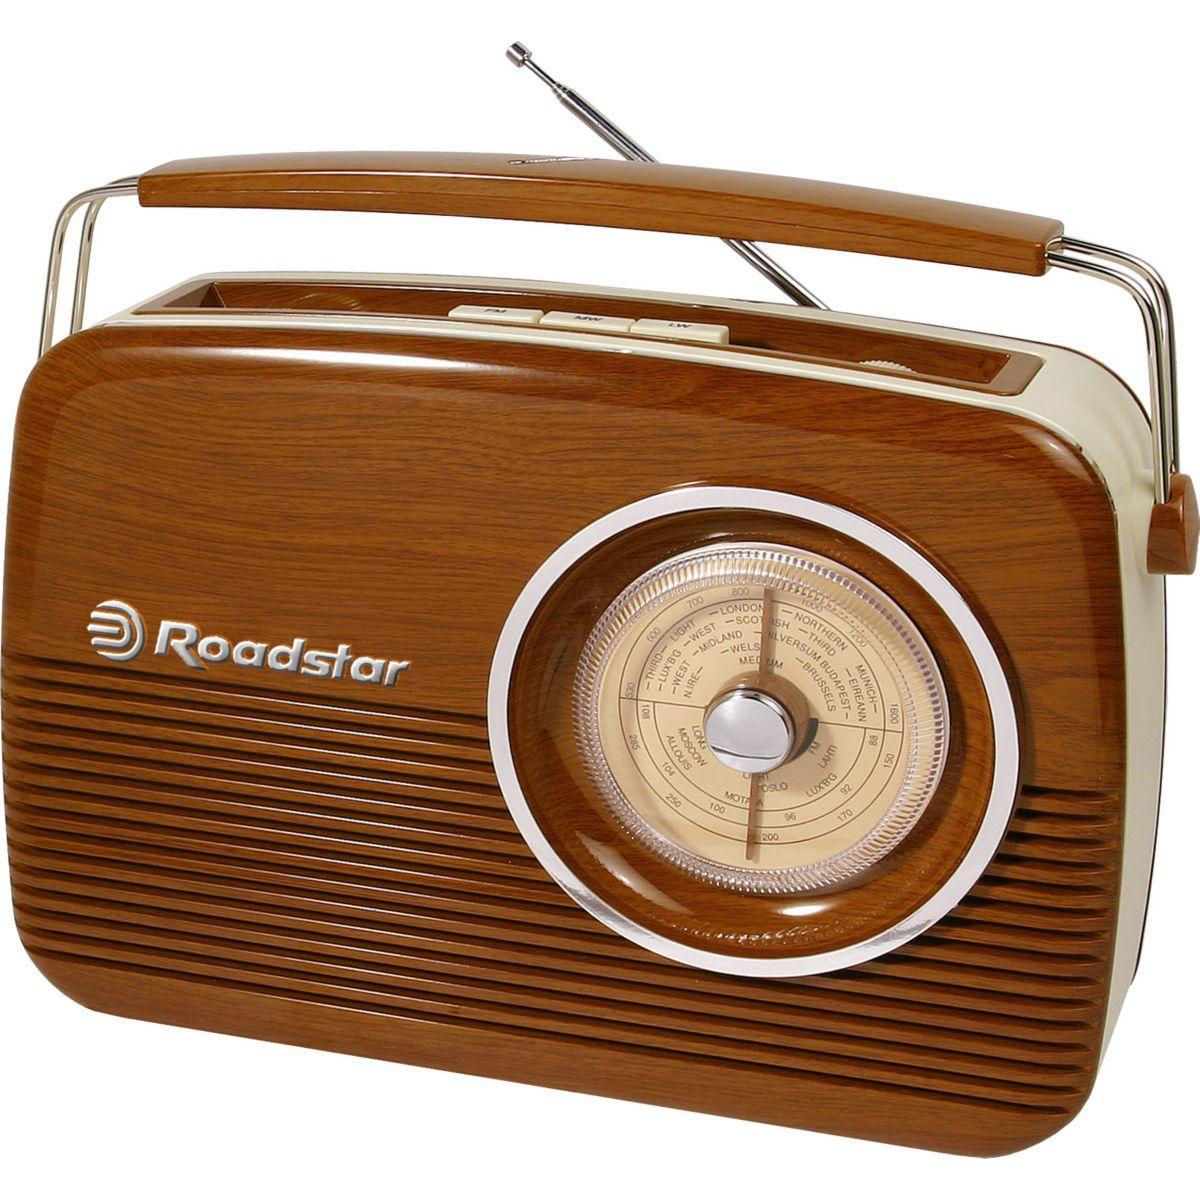 Radio analogique roadstar tra-1957 cr